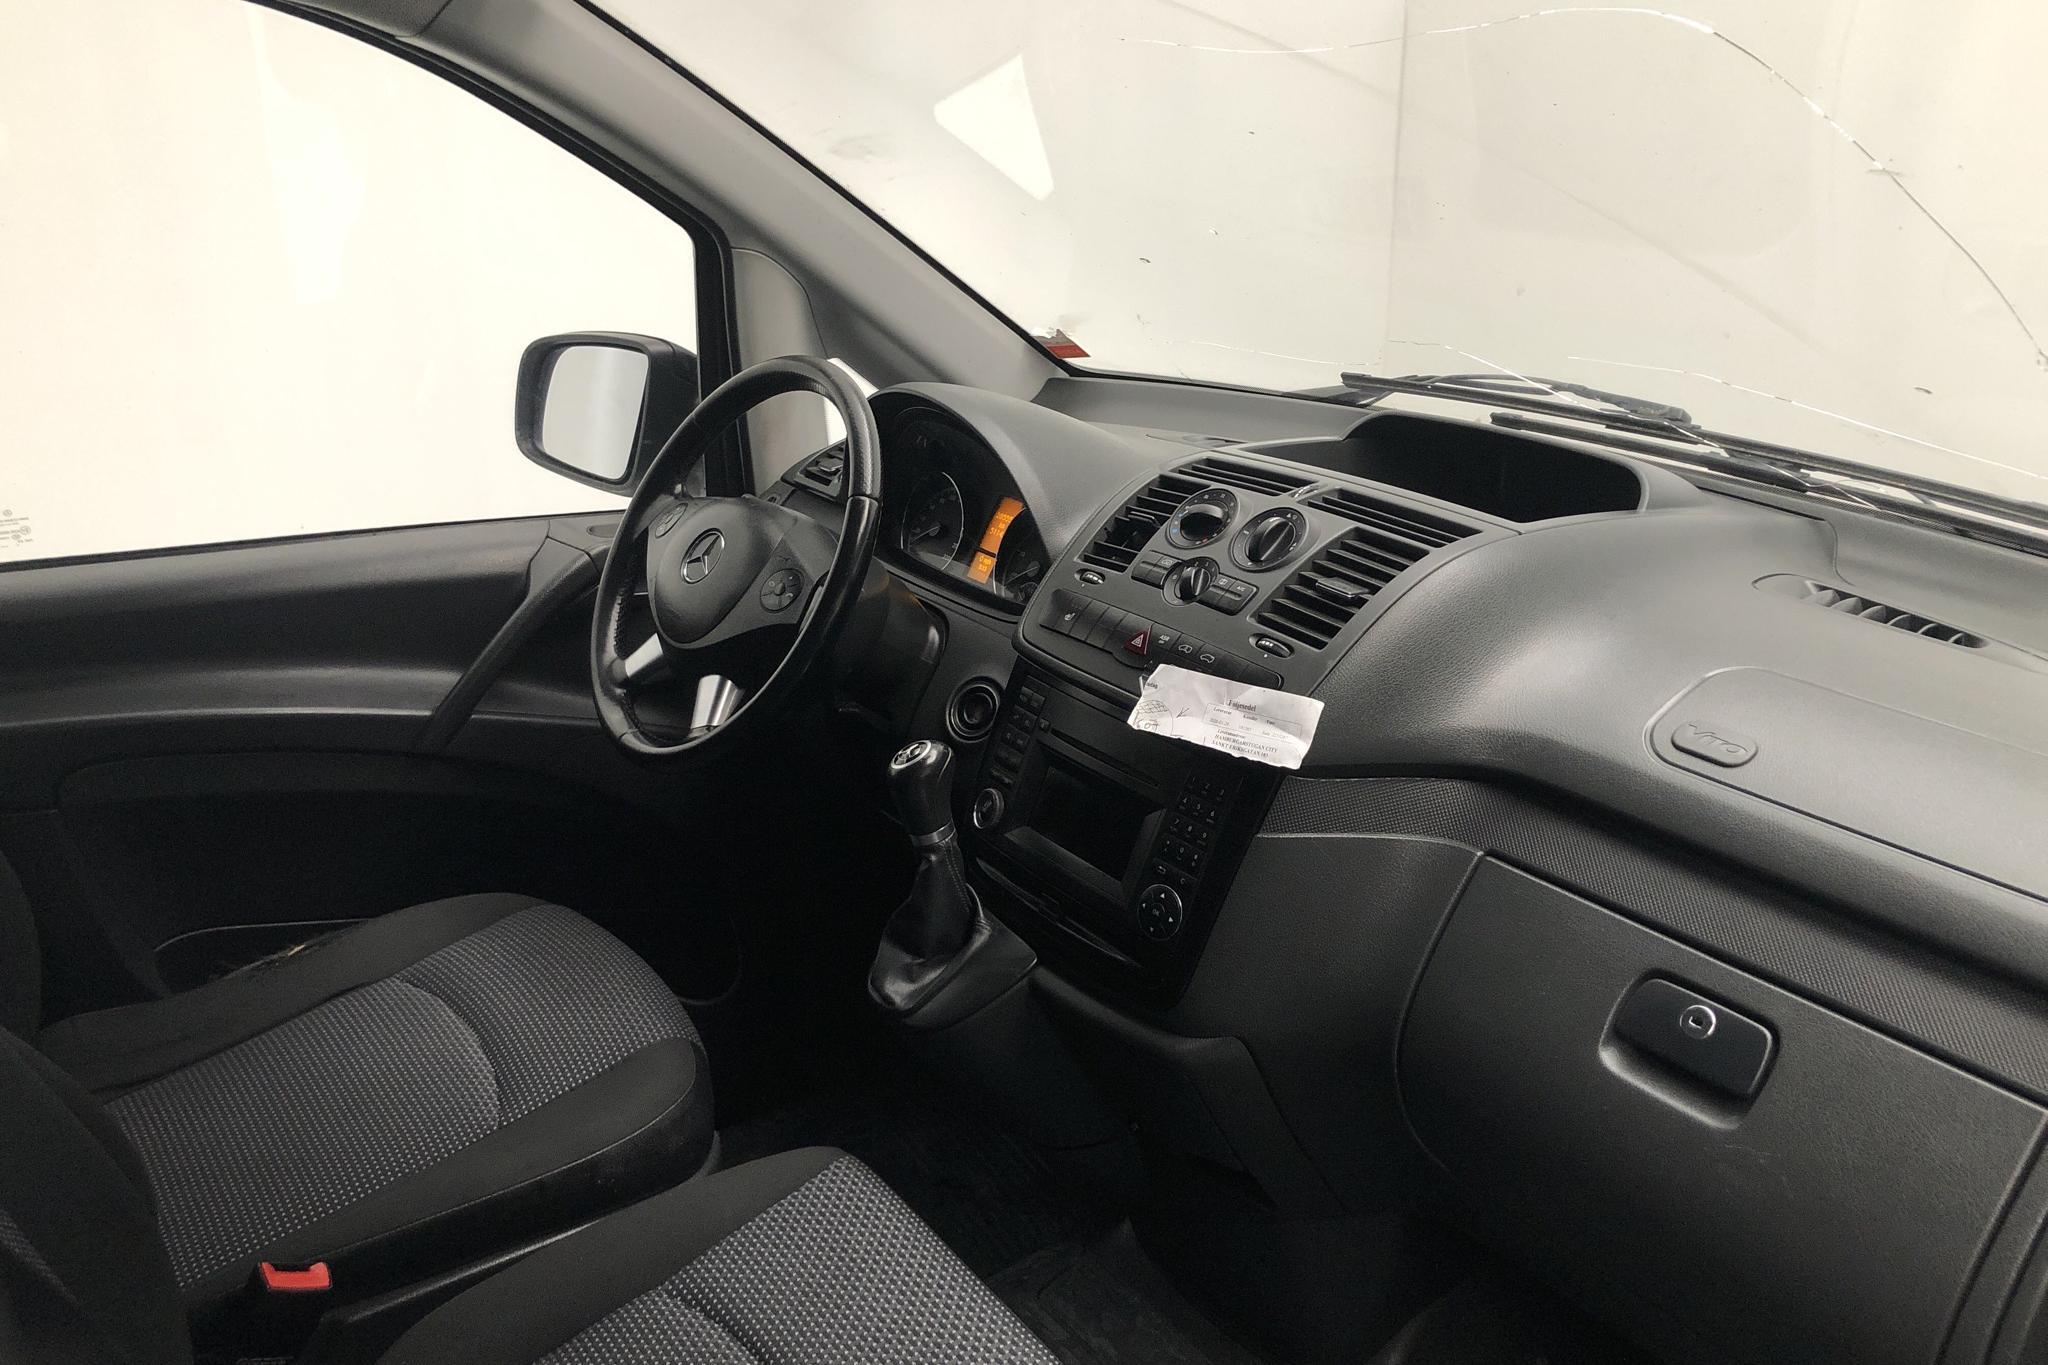 Mercedes Vito 116 CDI W639 (163hk) - 28 554 mil - Automat - orange - 2012